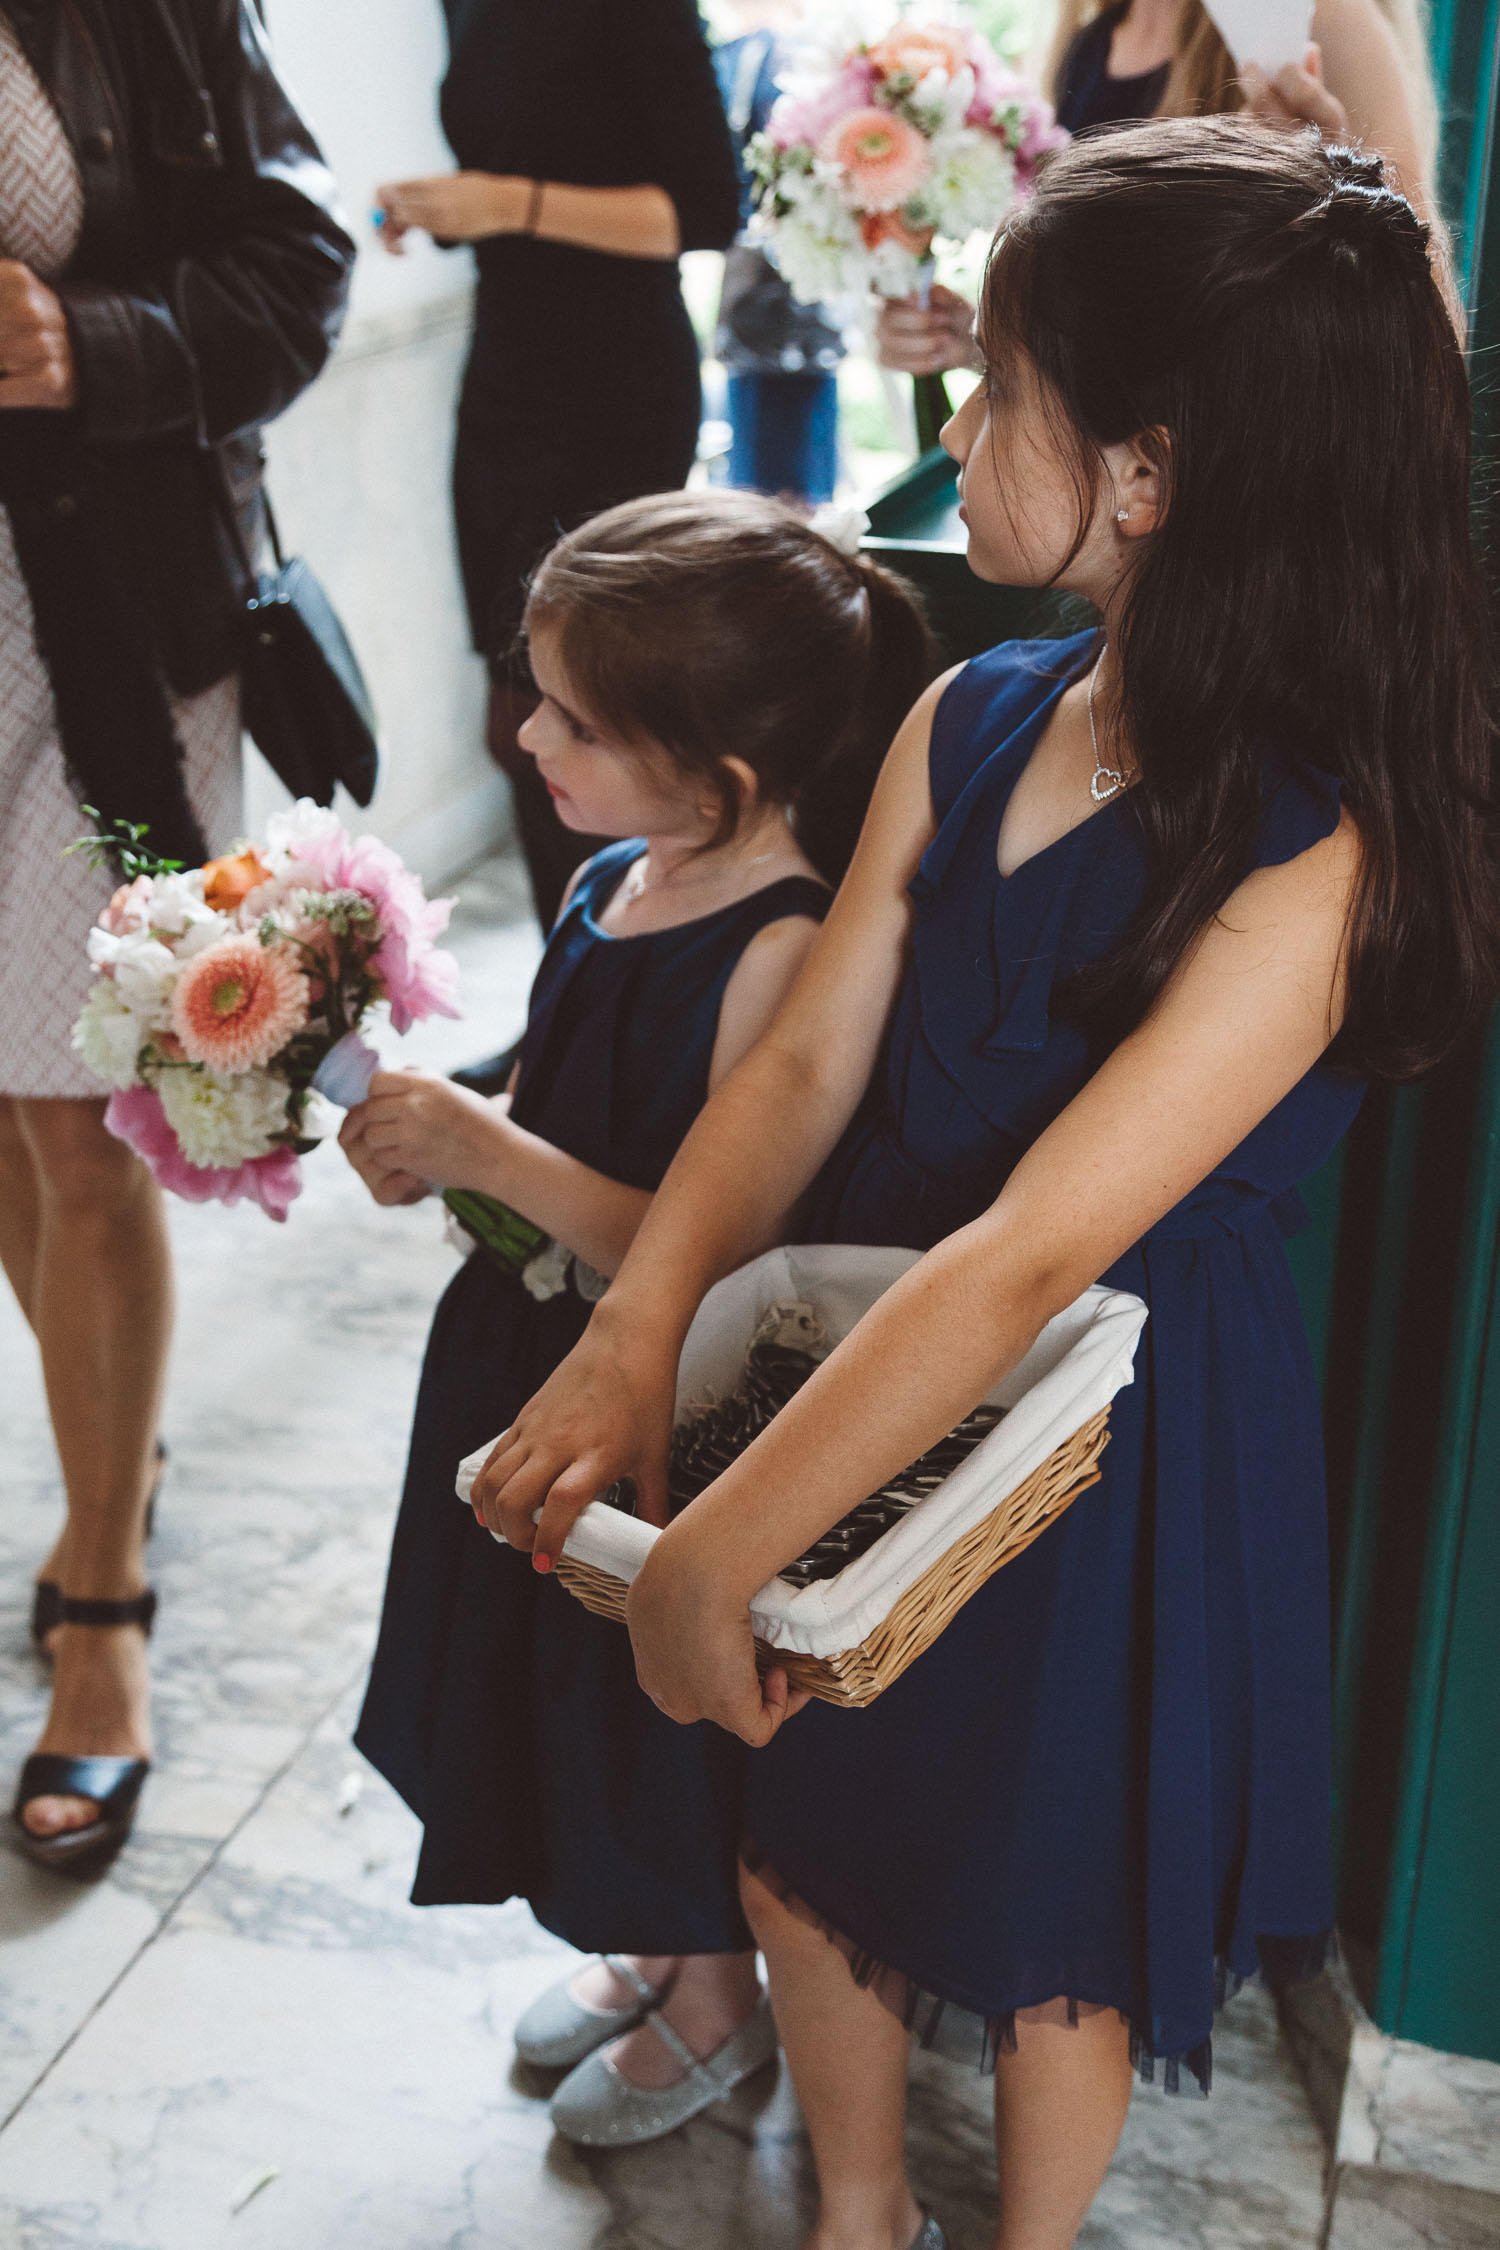 Wedding-huwelijk-trouwen-bruiloft-photography-fotografie-fotograaf-photographer-Huize-Frankendael-On-a-hazy-morning-Amsterdam-The-Netherlands-20.jpg